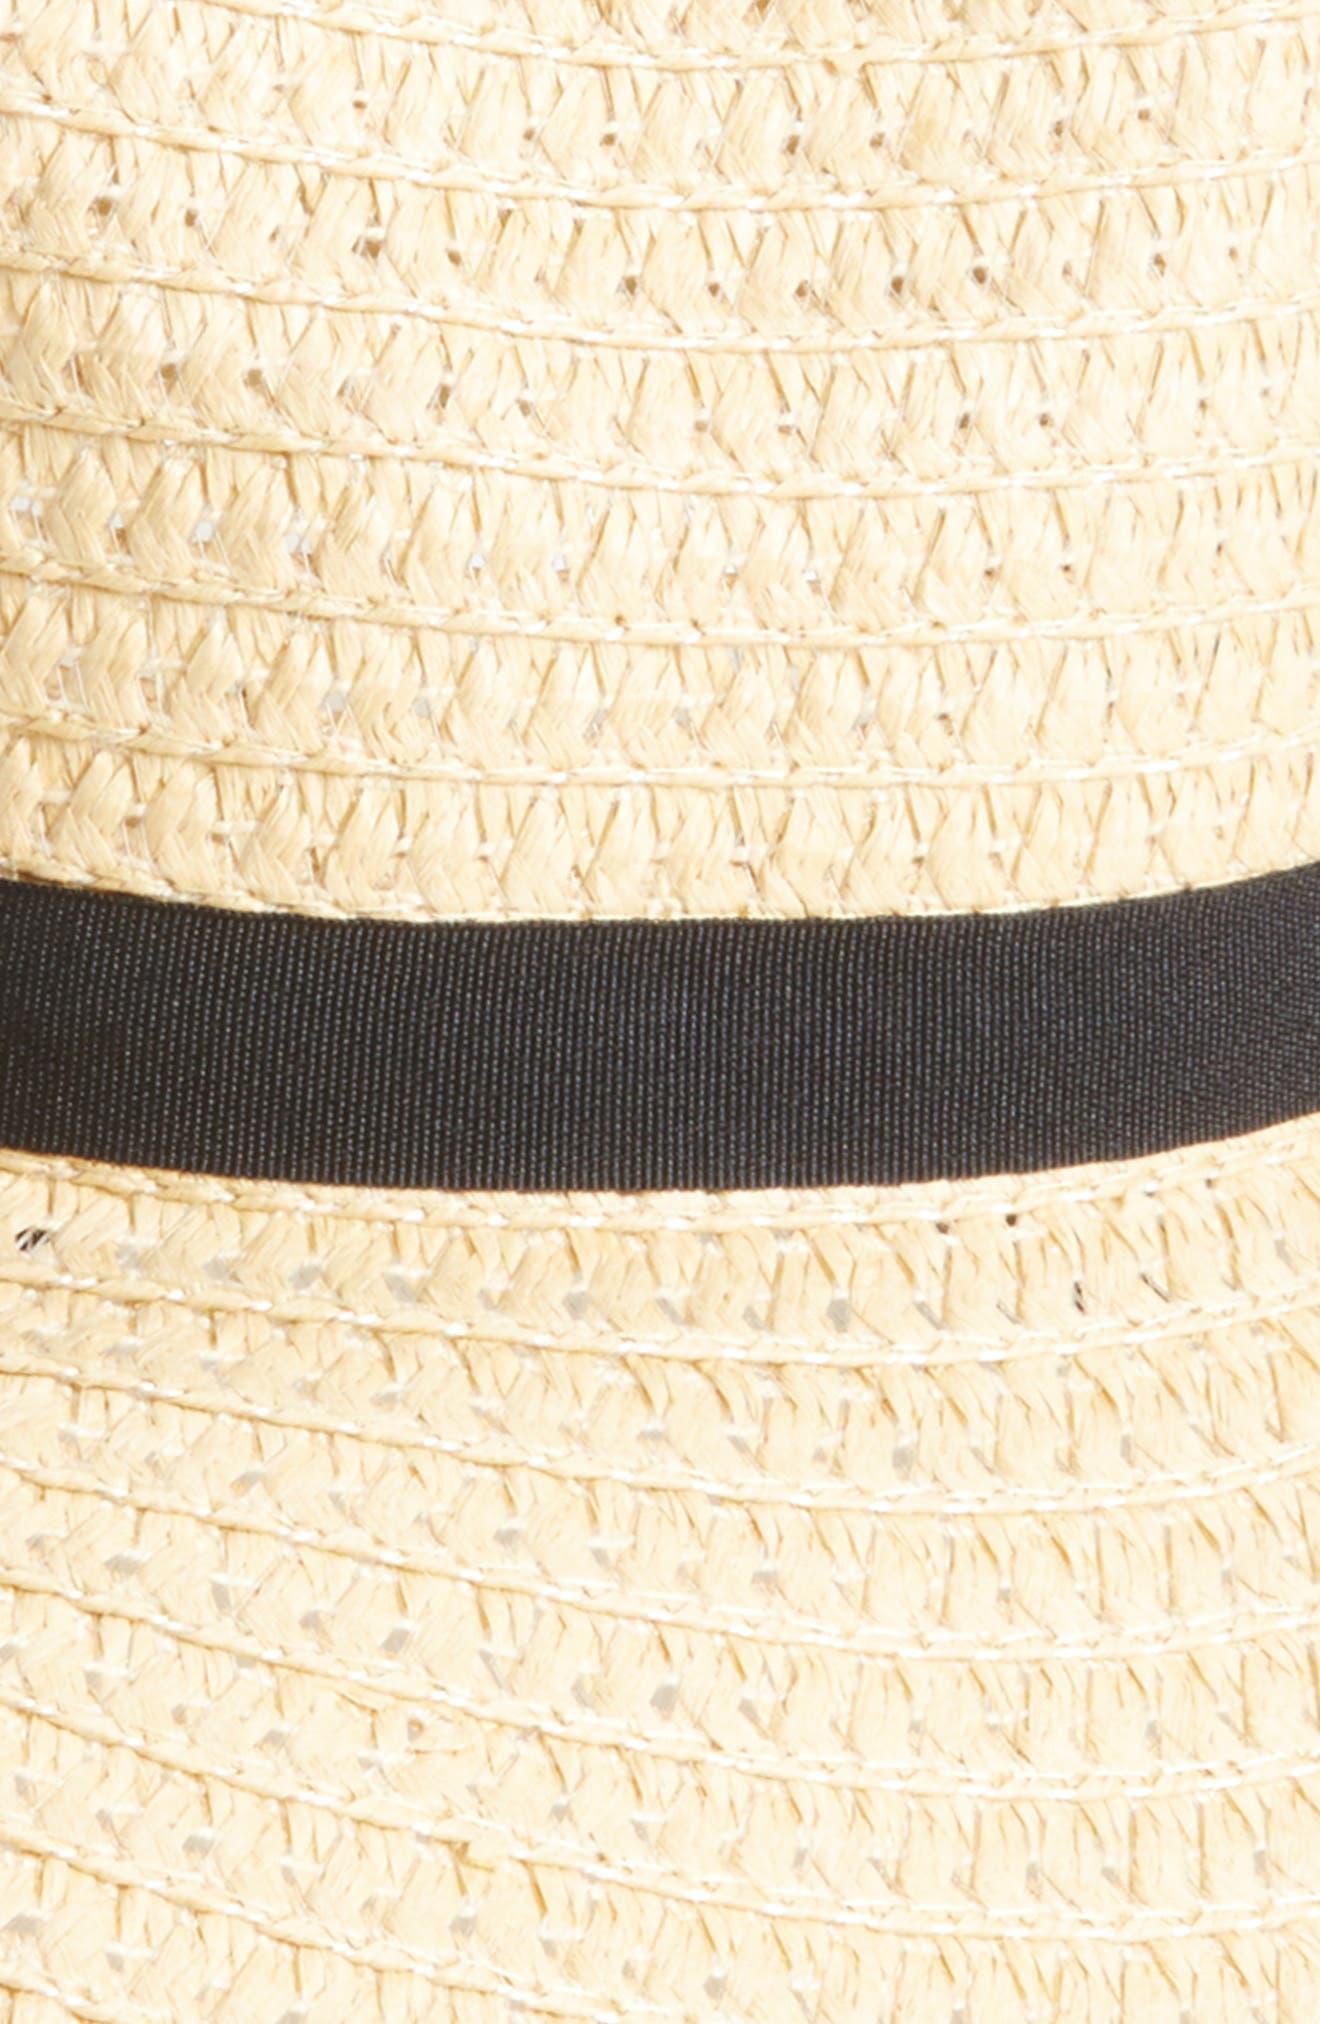 Wide Brim Staw Hat,                             Alternate thumbnail 2, color,                             NATURAL/ BLACK